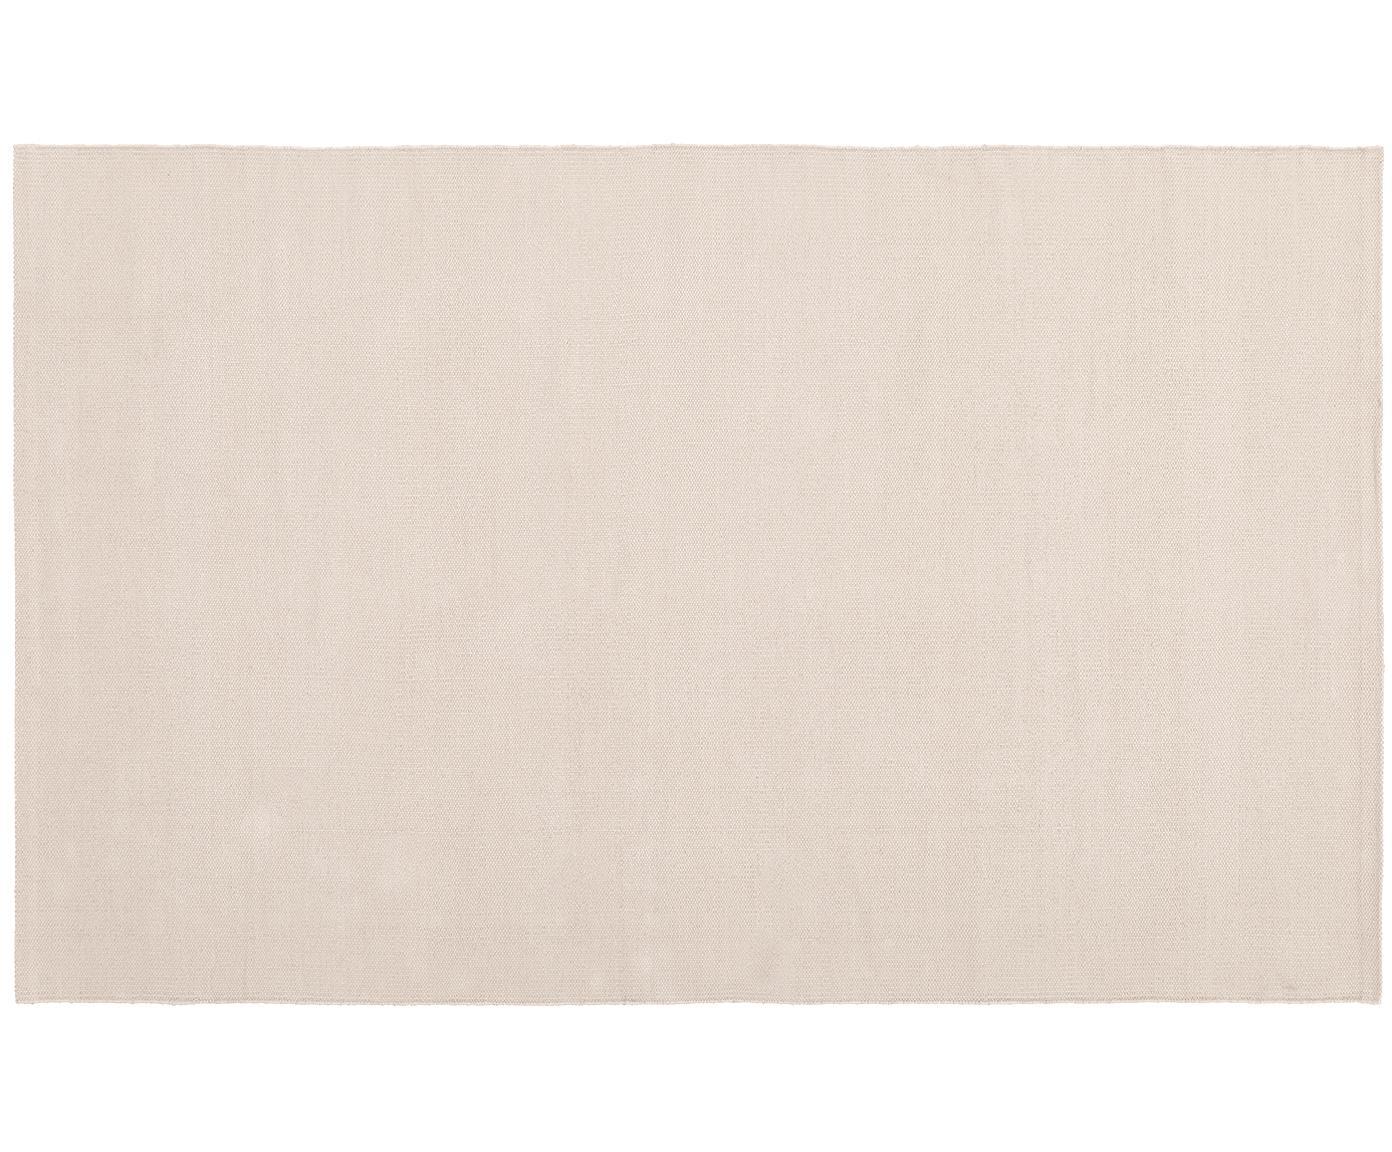 Alfombra artesanal de algodón Agneta, Algodón, Gris pardo, An 50 x L 80 cm (Tamaño XXS)